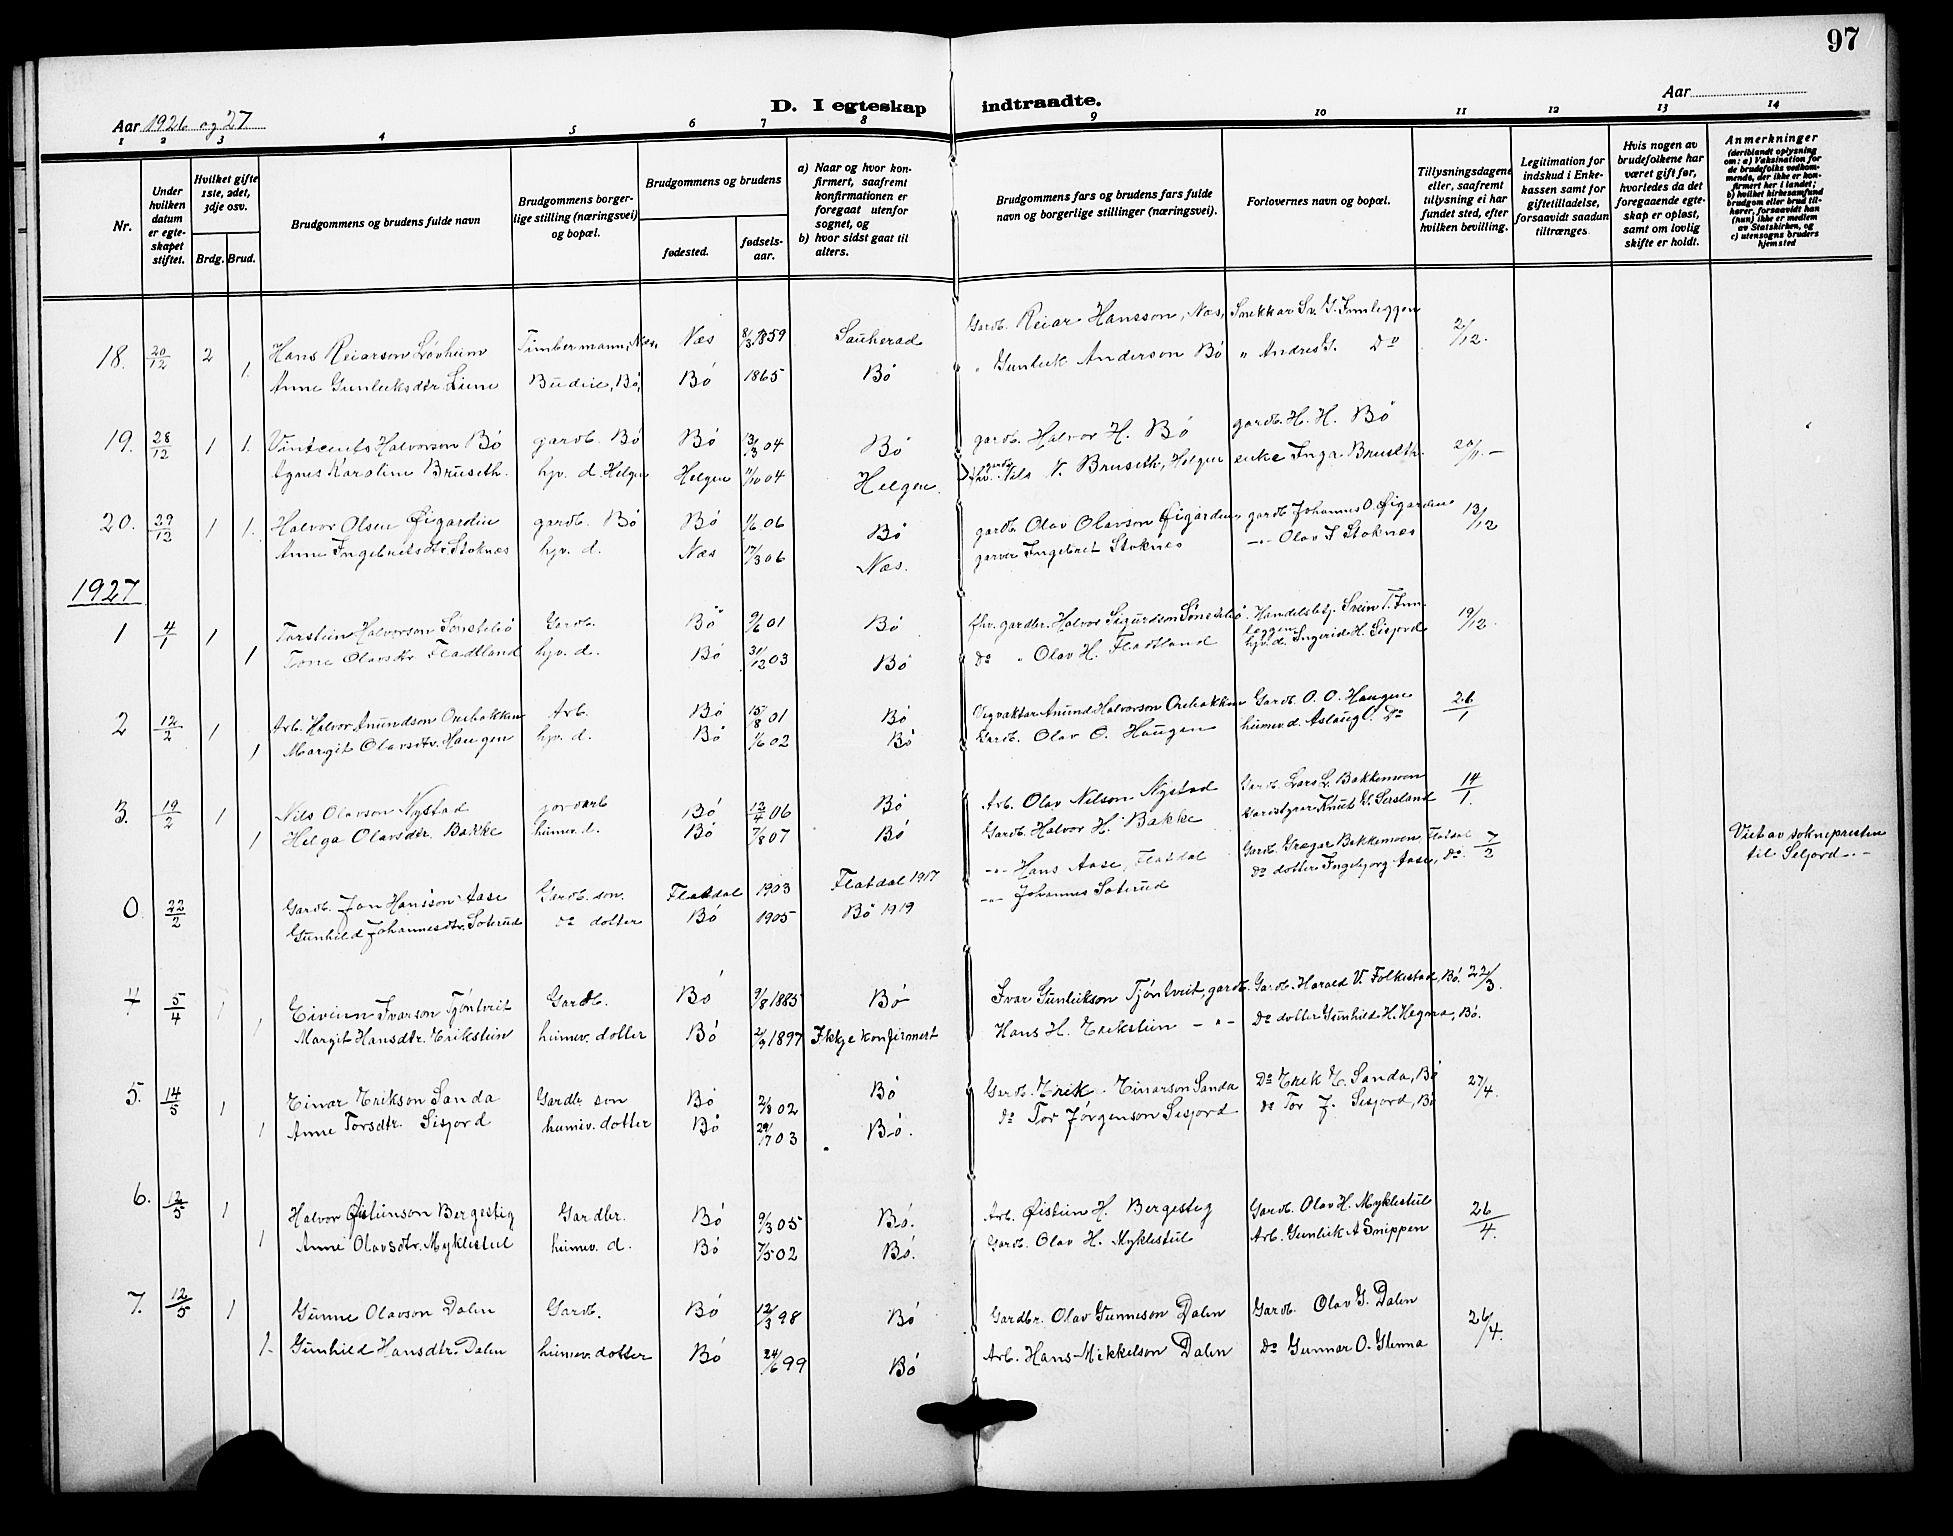 SAKO, Bø kirkebøker, G/Ga/L0008: Klokkerbok nr. 8, 1920-1930, s. 97